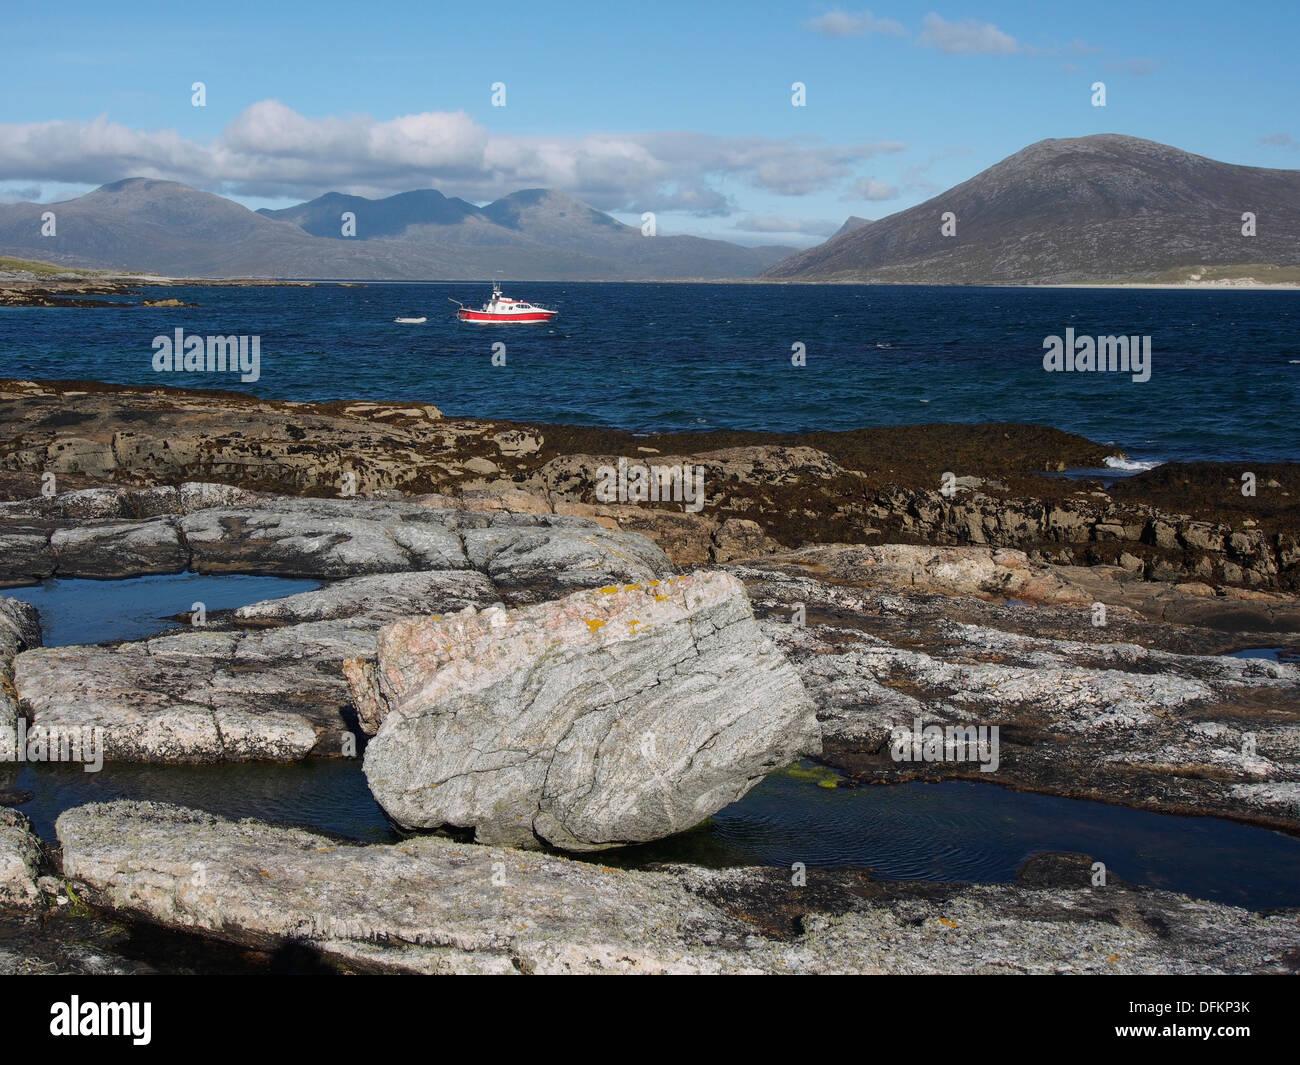 MV Enchanted Isle, Taransay, Scotland - Stock Image